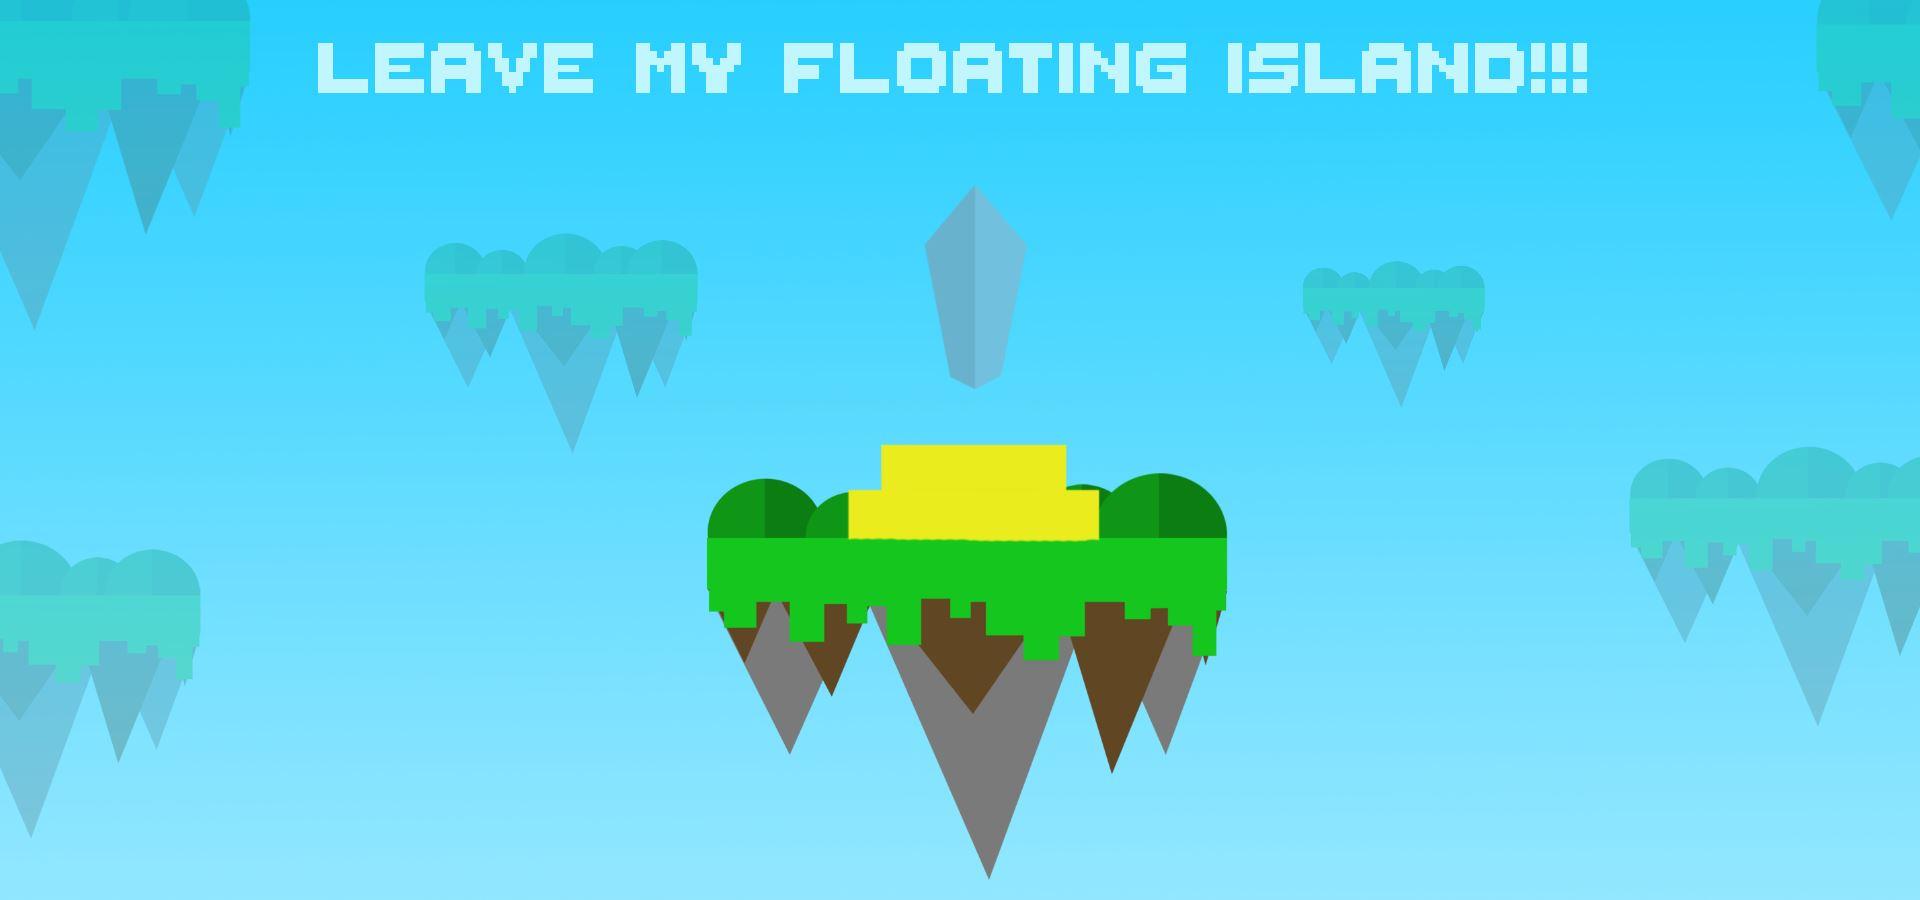 LEAVE MY FLOATING ISLAND!!!